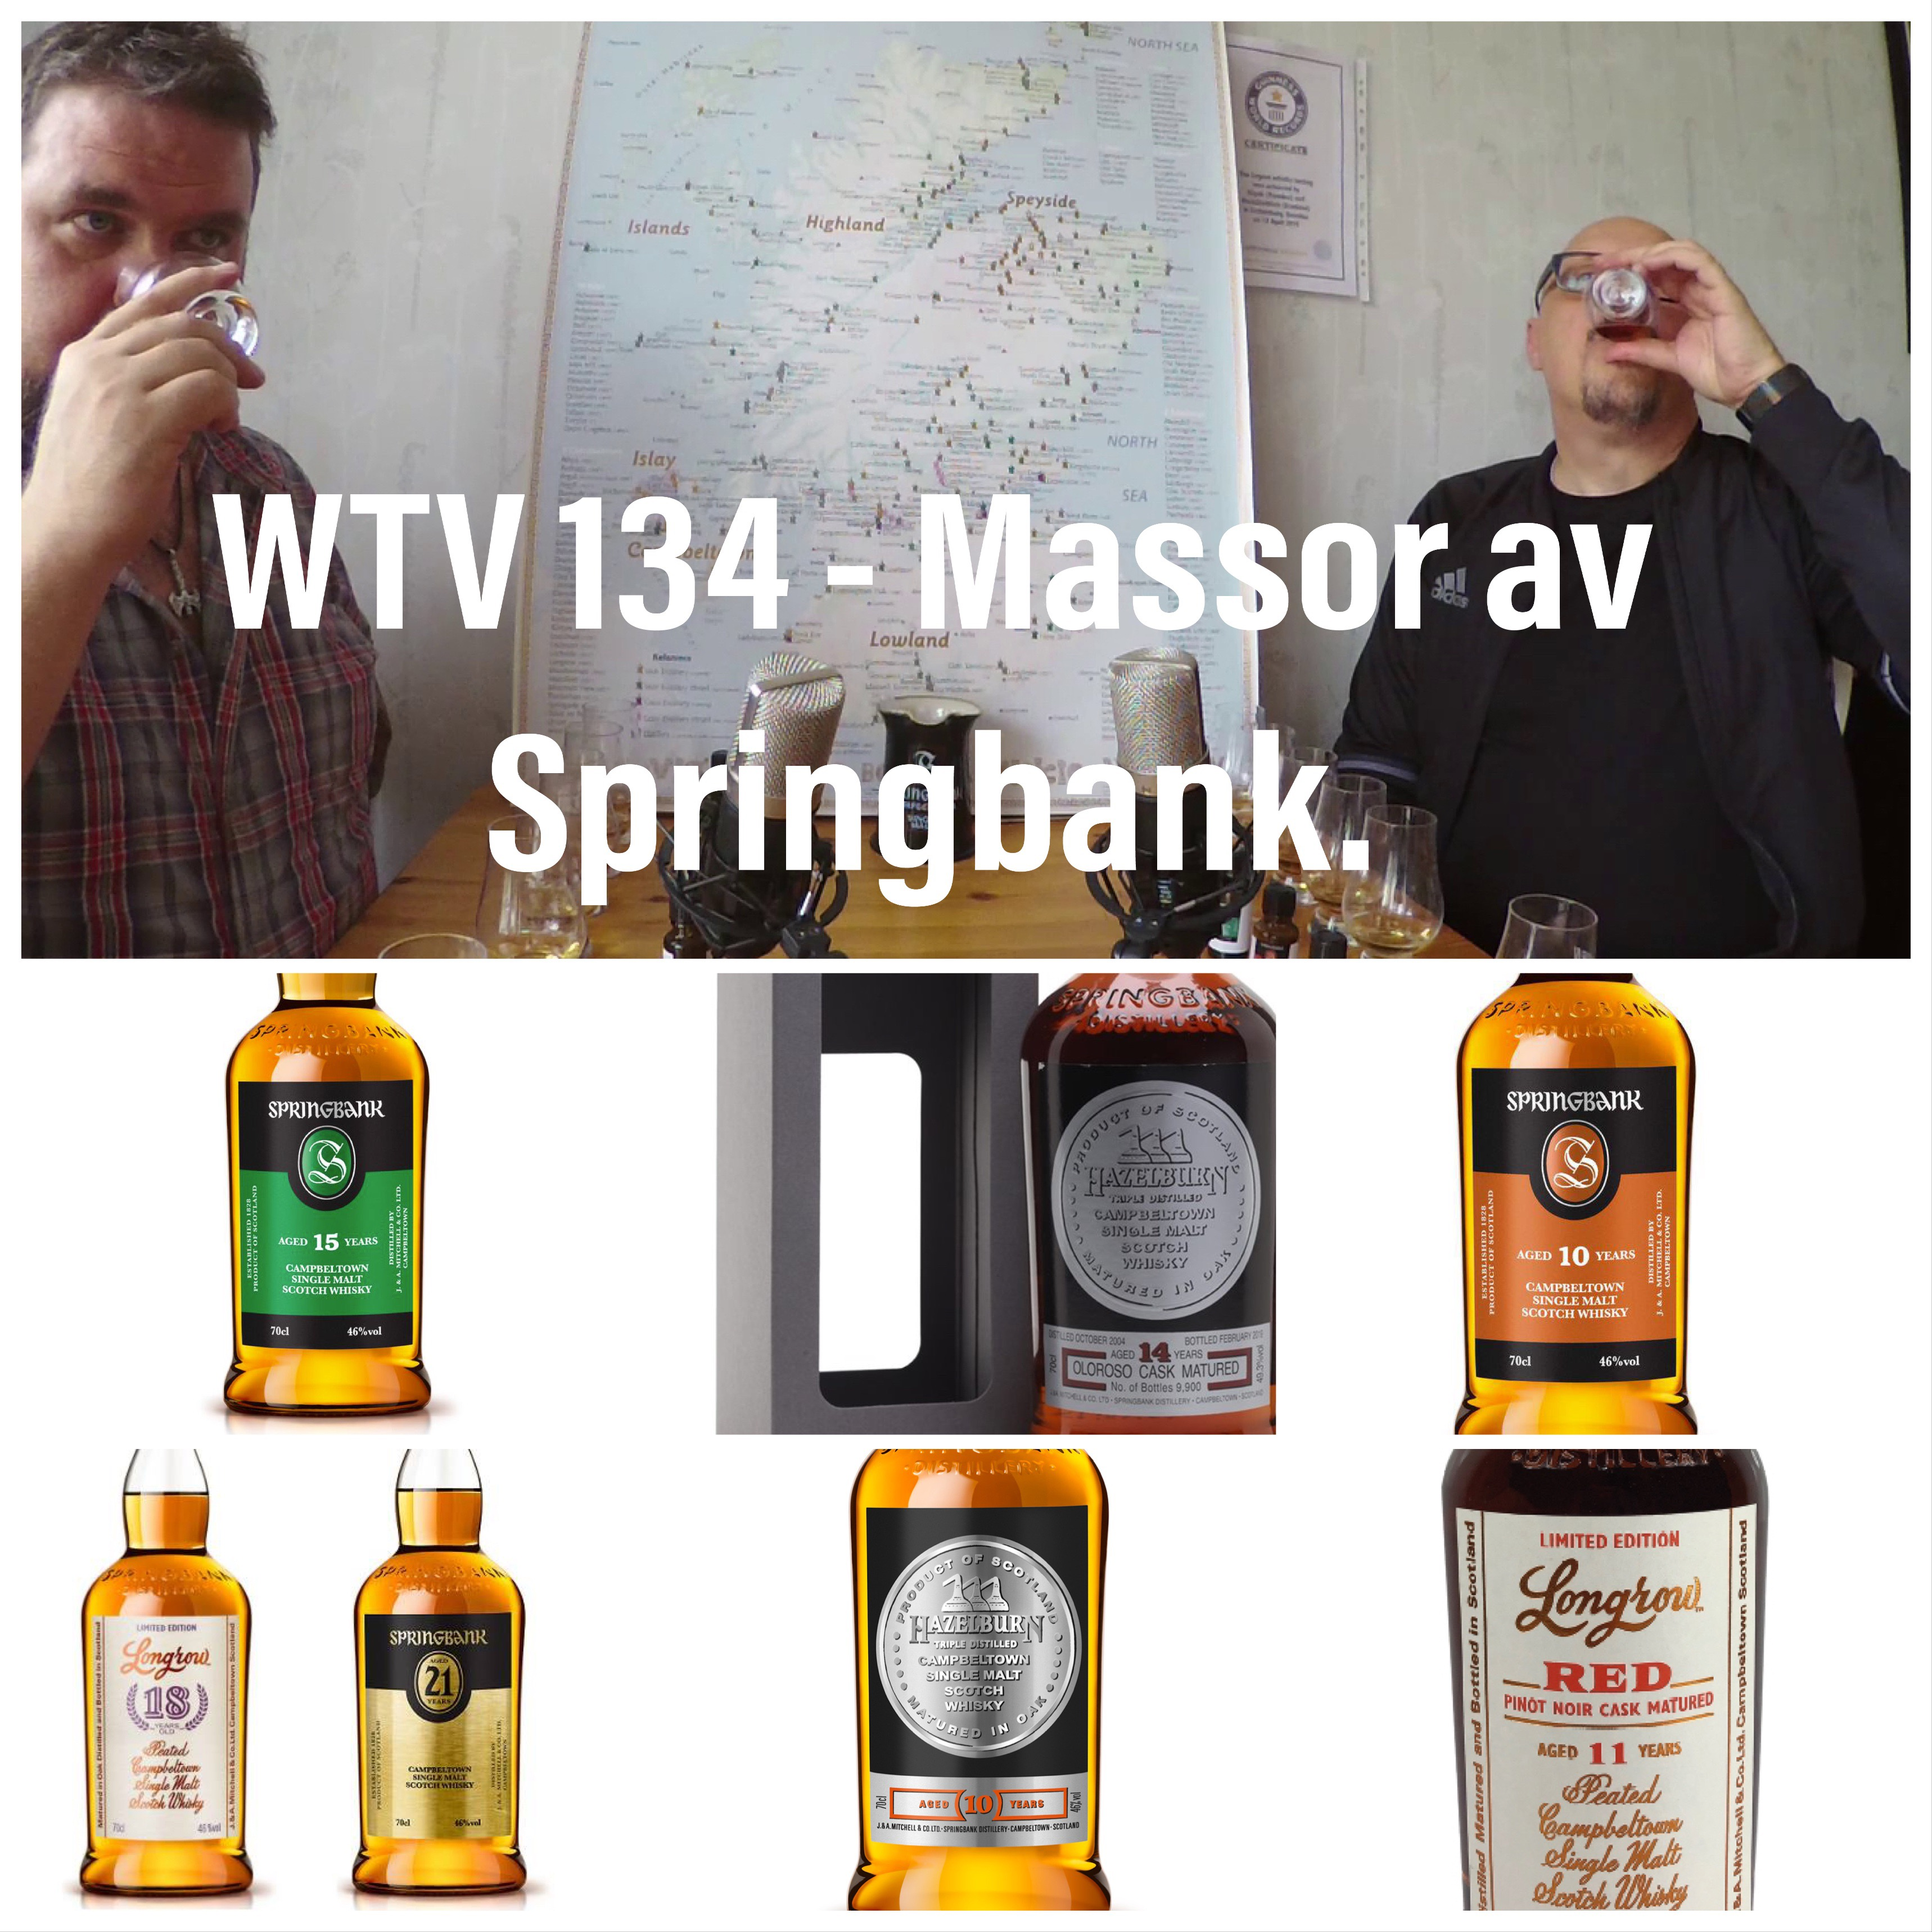 WTV 134 – Massor av Springbank